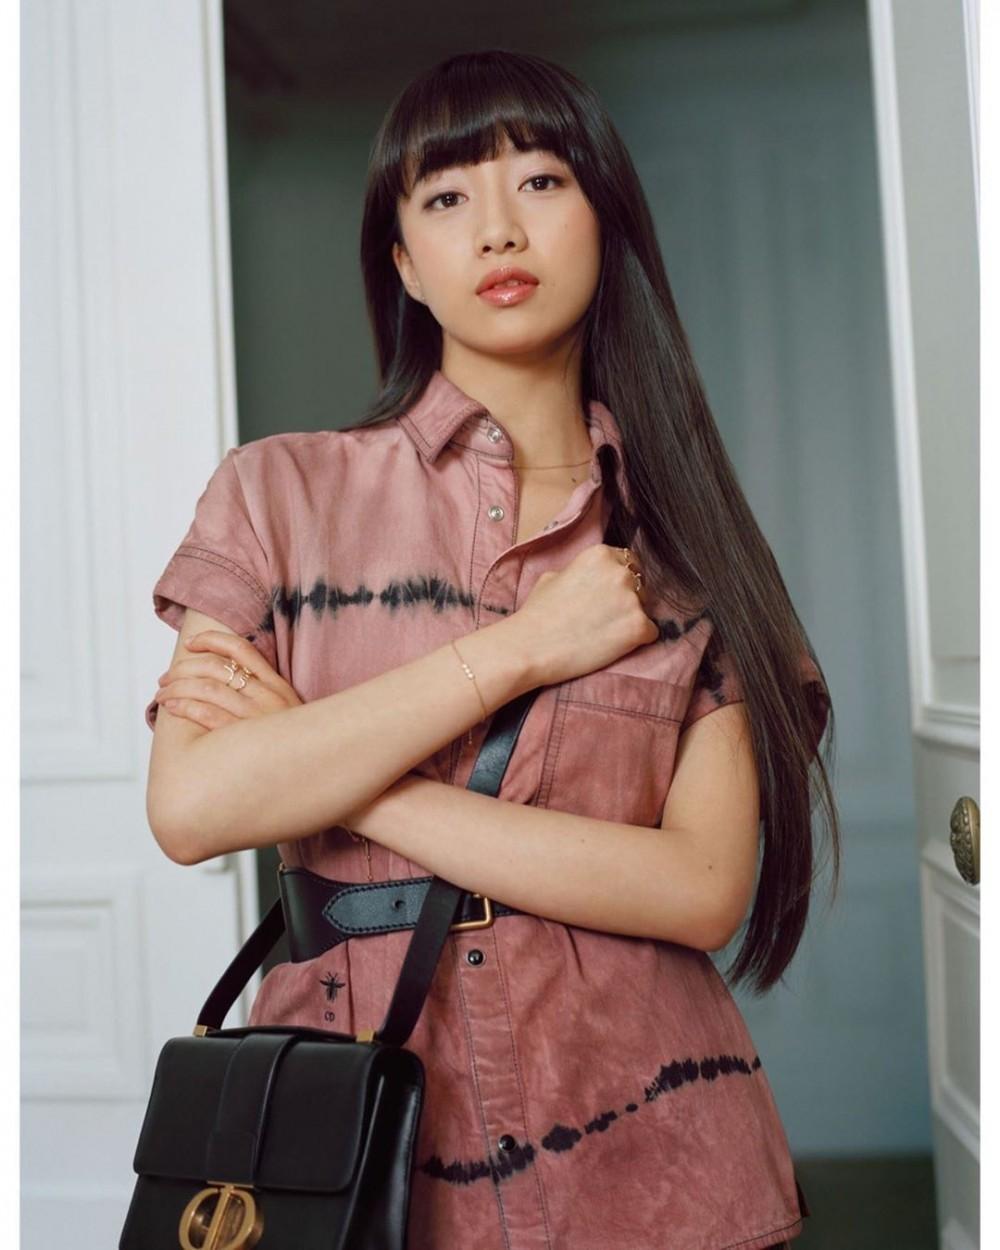 18歲木村心美Cocomi Dior大使